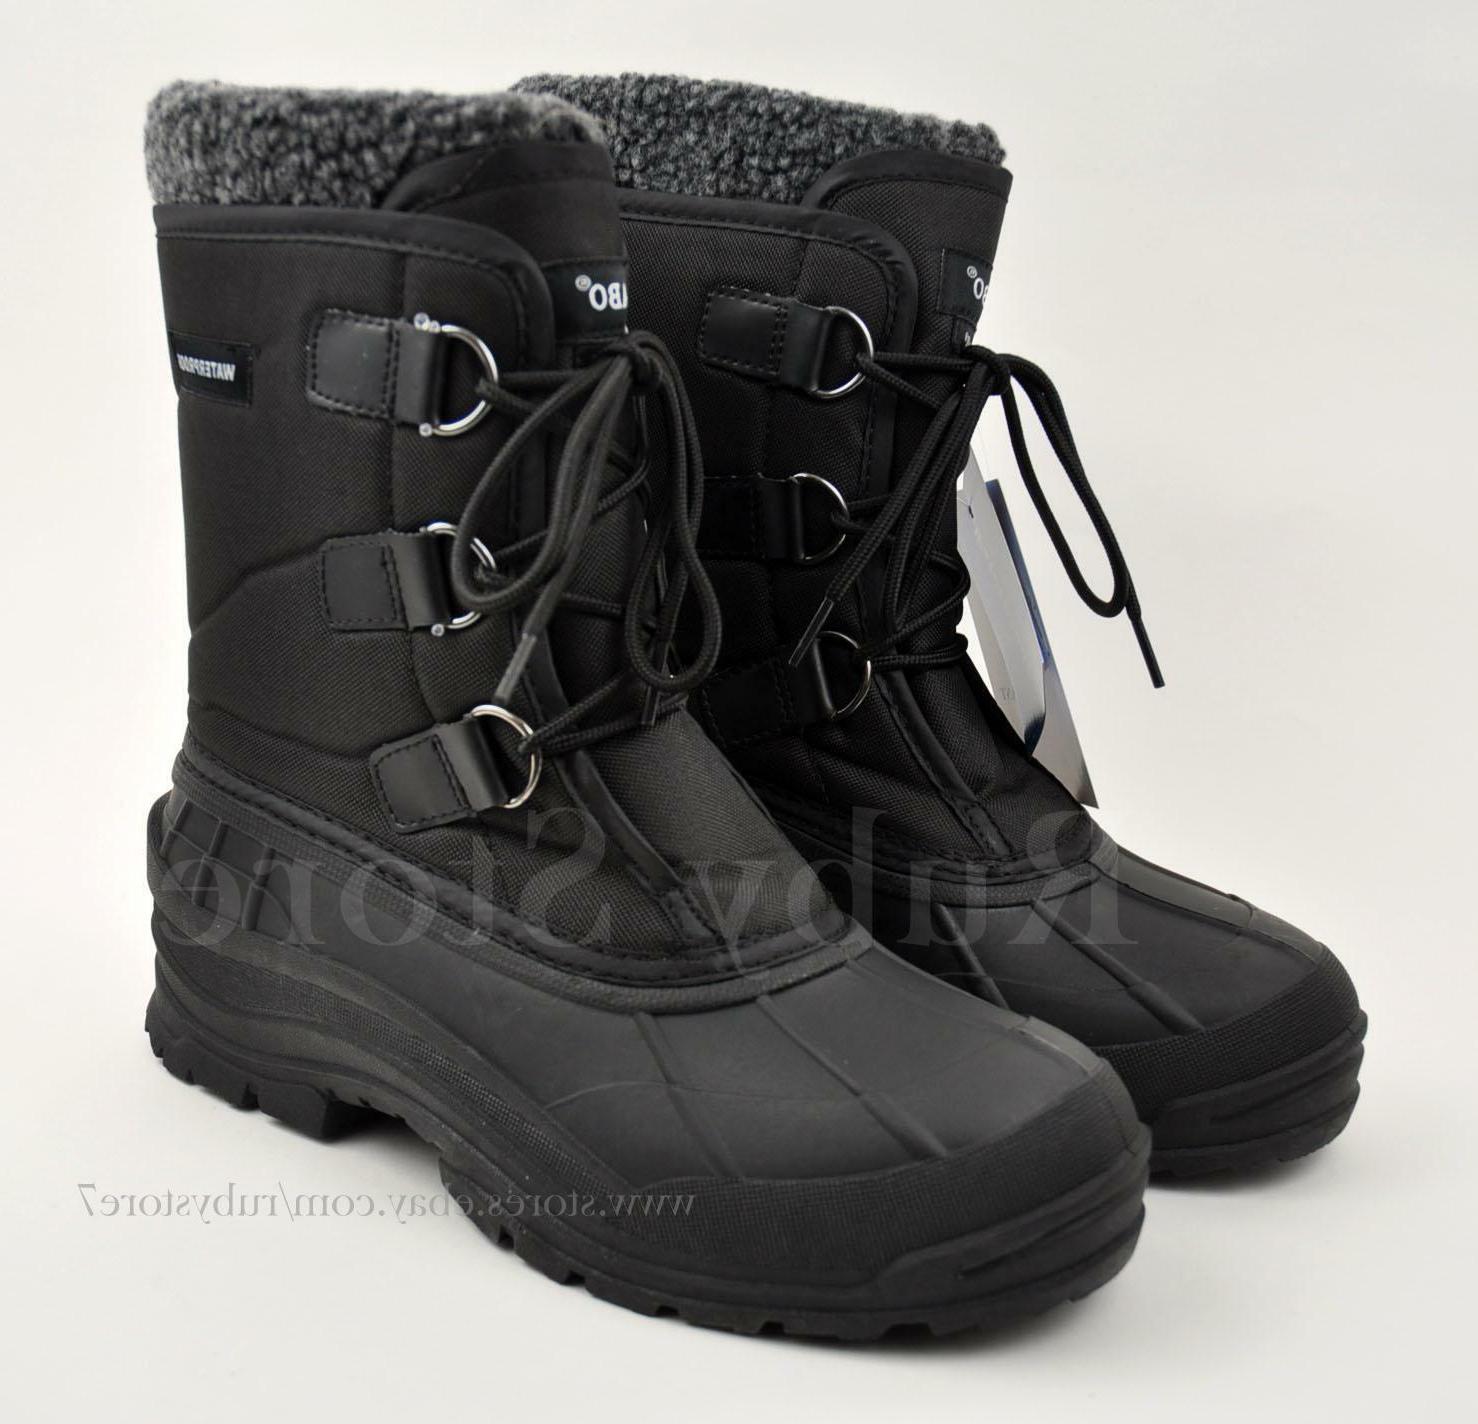 "Men's Black 9"" Winter Snow Hunting Work Boots Shoes Waterpro"